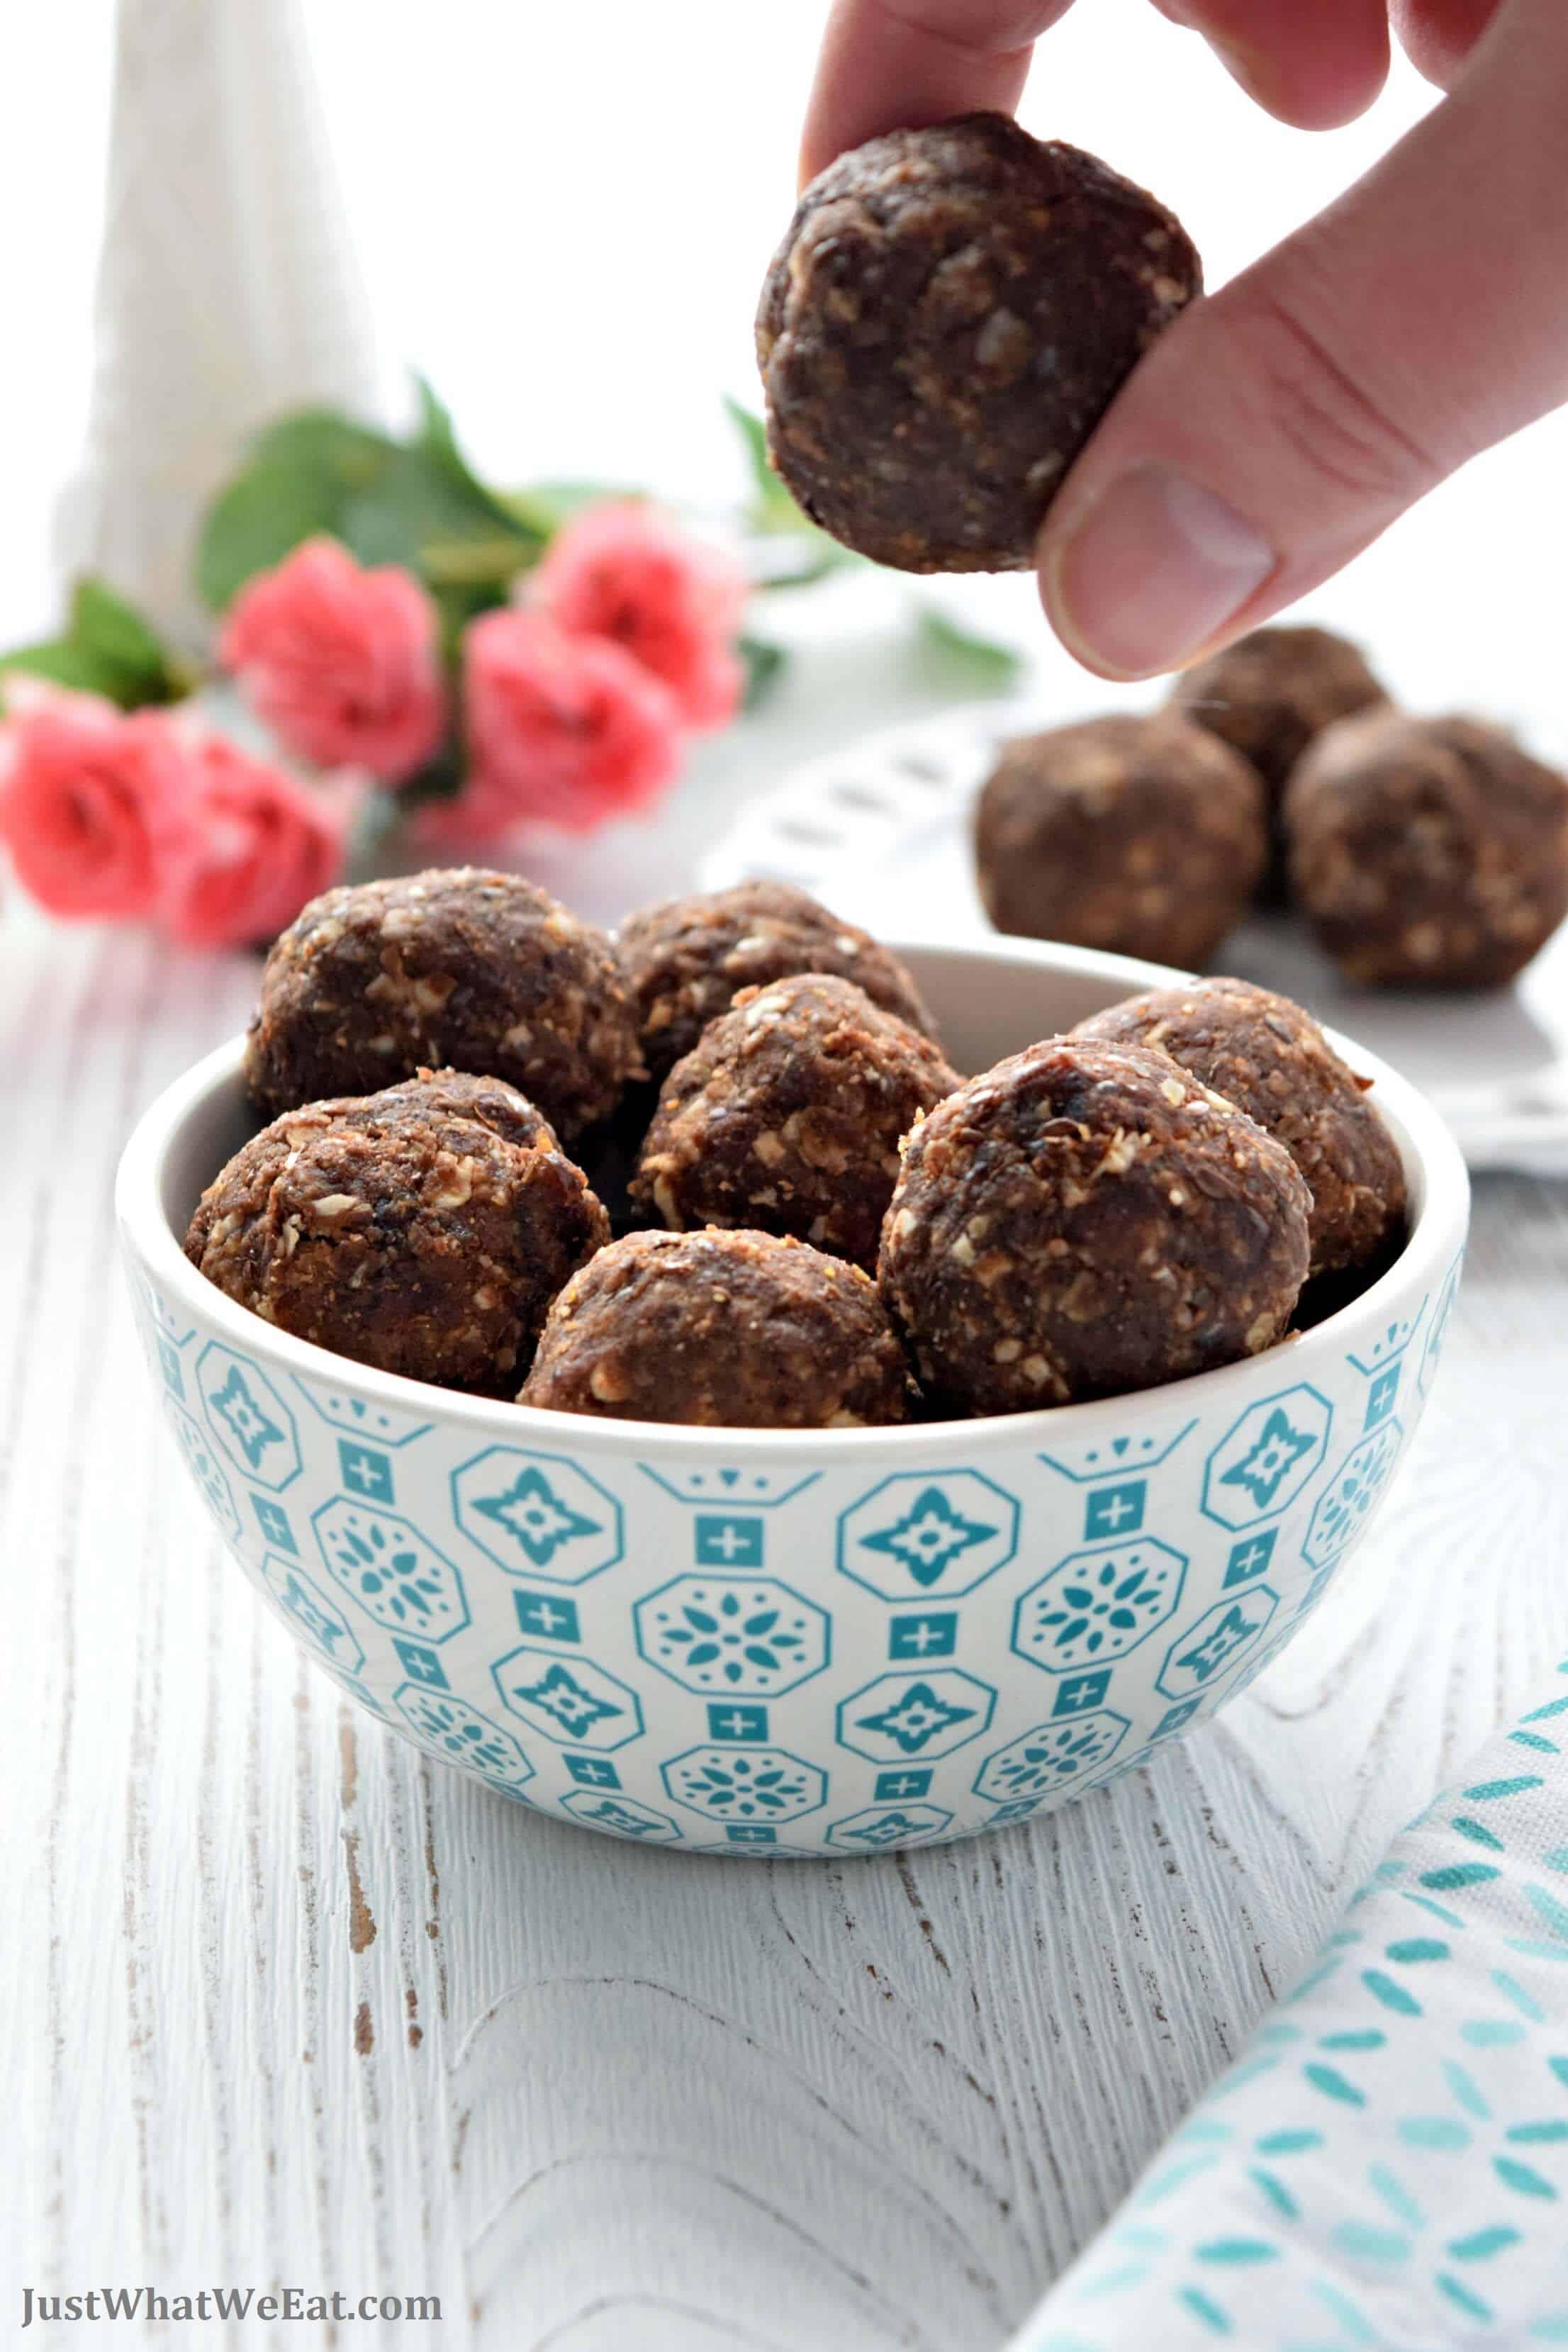 Chocolate Peanut Butter Energy Bites - Gluten Free, Vegan, Refined Sugar Free